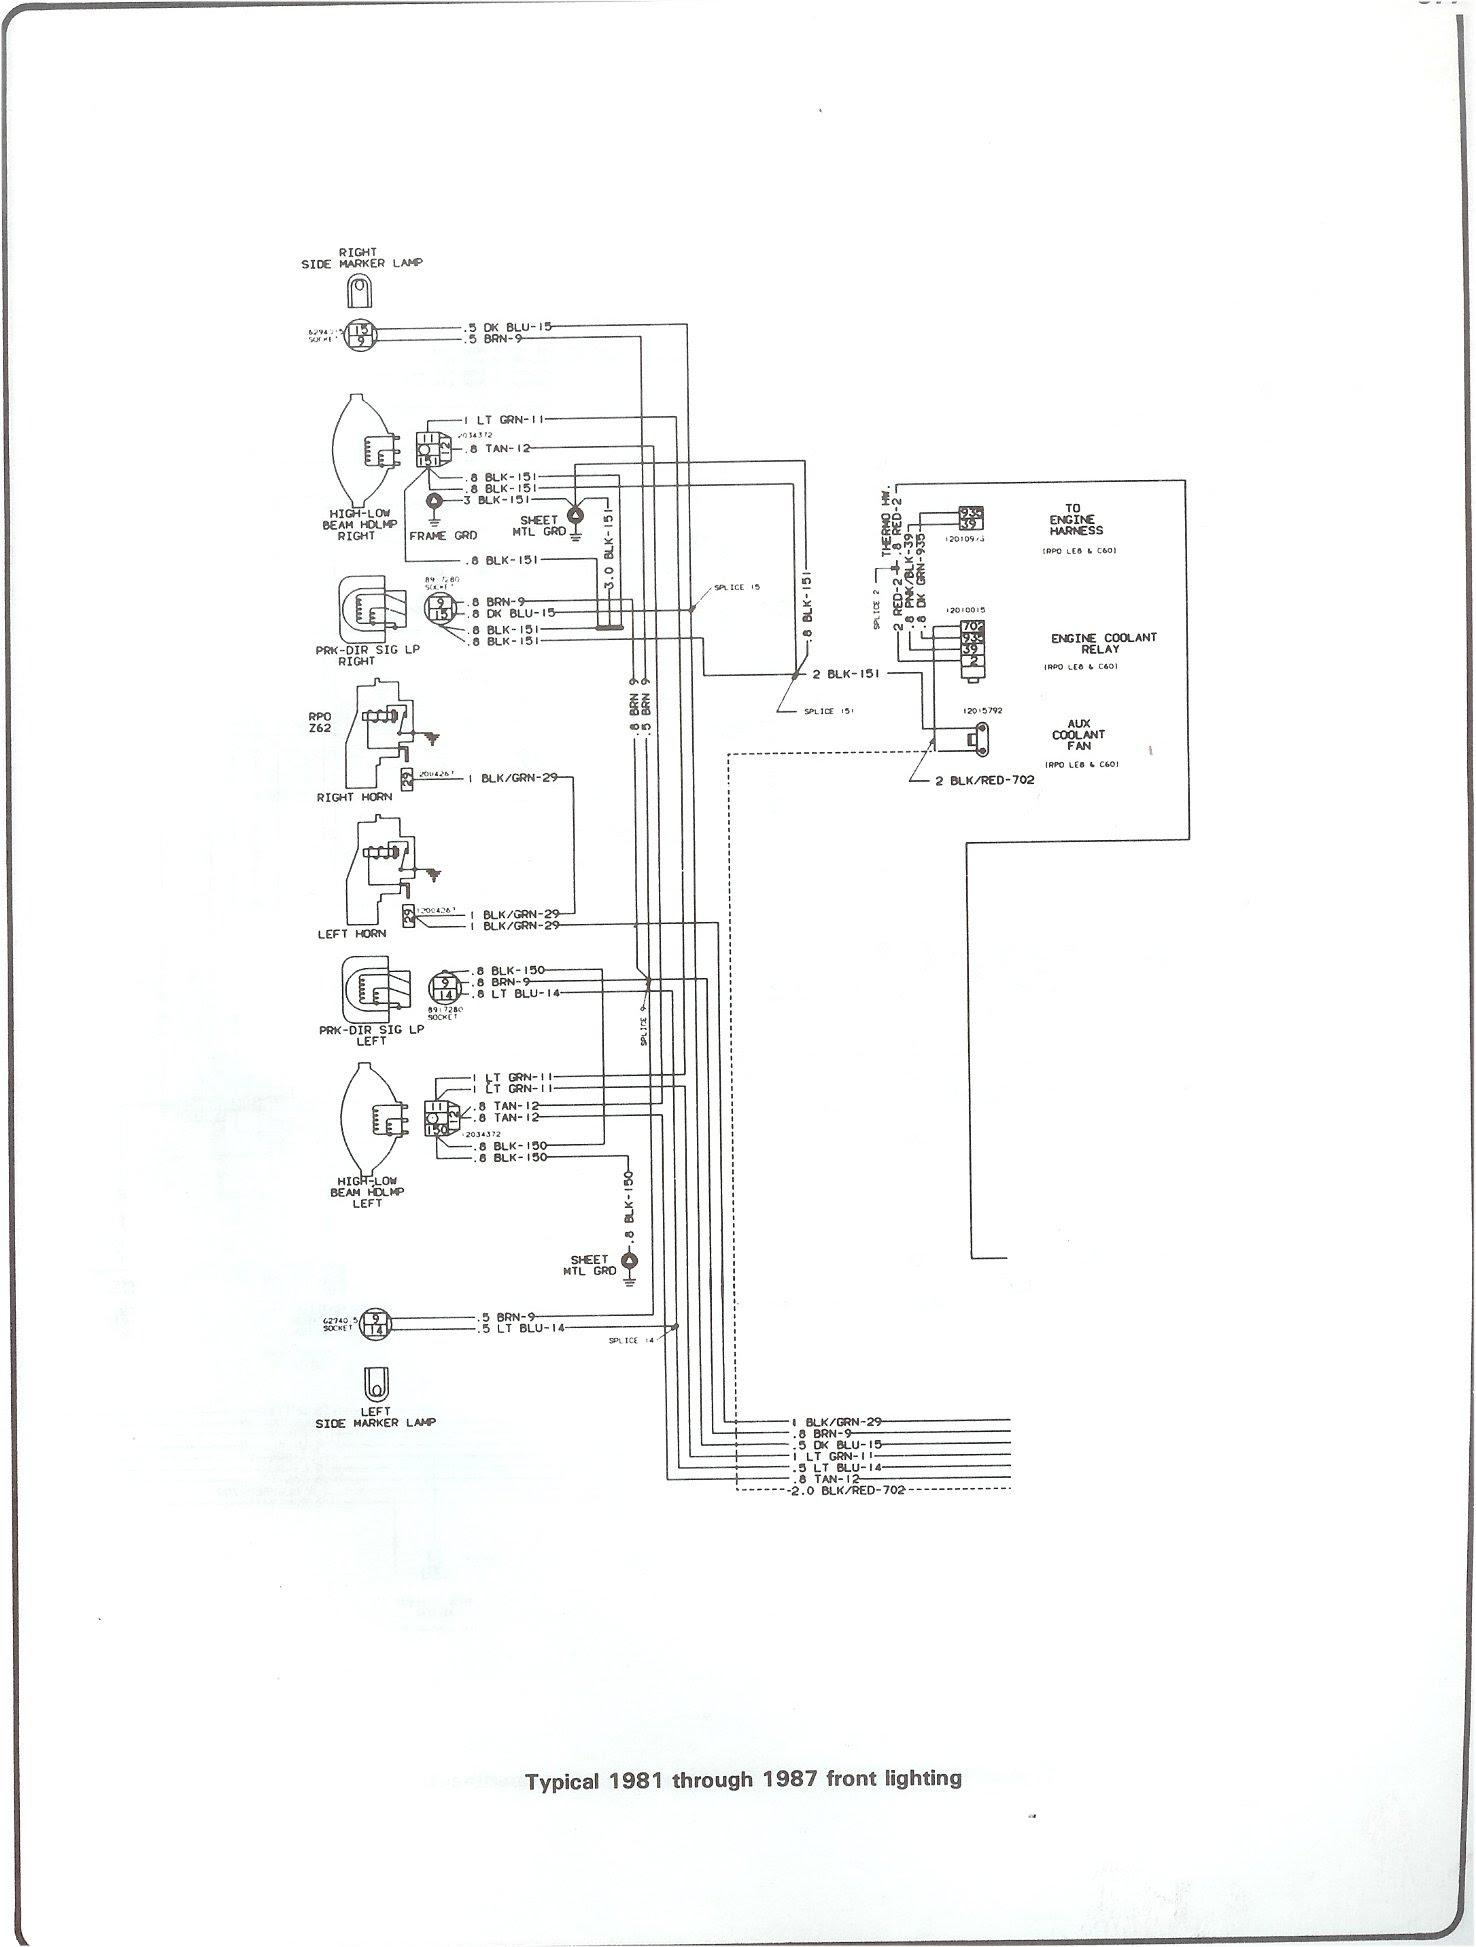 2008 Chevy Silverado Tail Light Wiring Diagram : chevy, silverado, light, wiring, diagram, Chevy, Silverado, Light, Wiring, Diagram